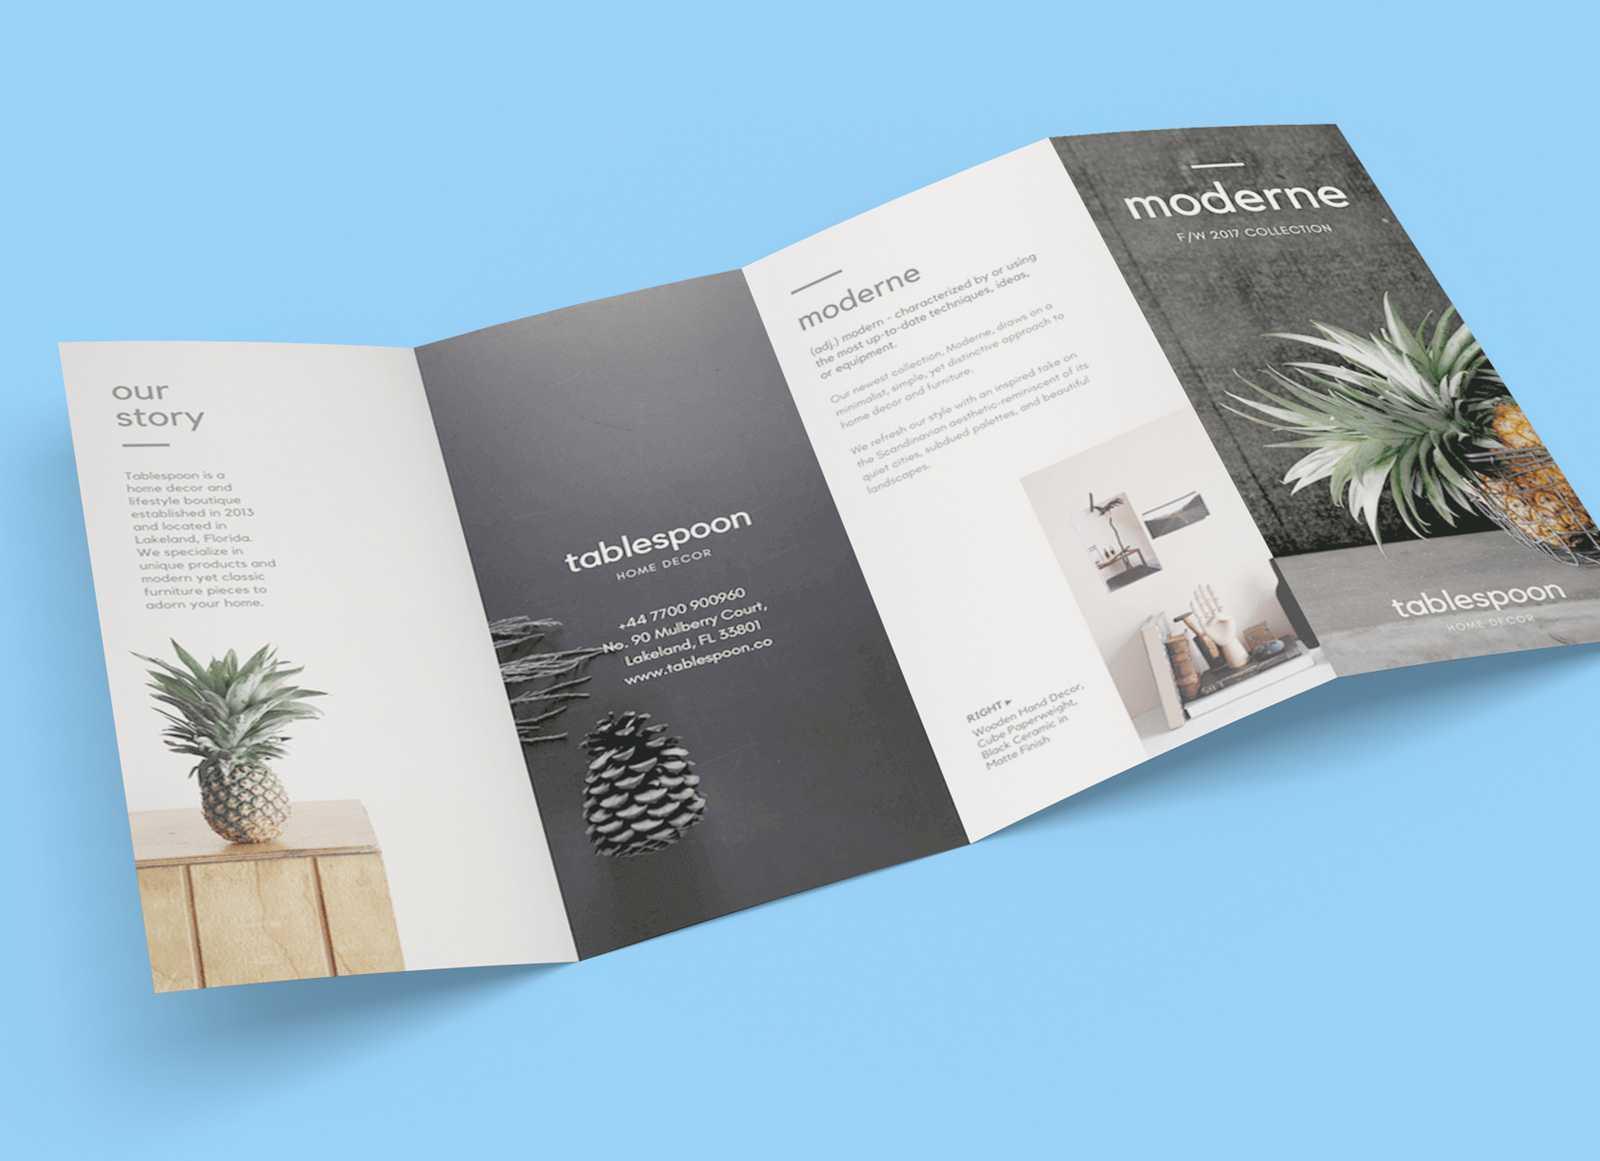 Free 4 Panel Quad Fold Brochure Mockup Psd - Good Mockups Throughout 4 Panel Brochure Template